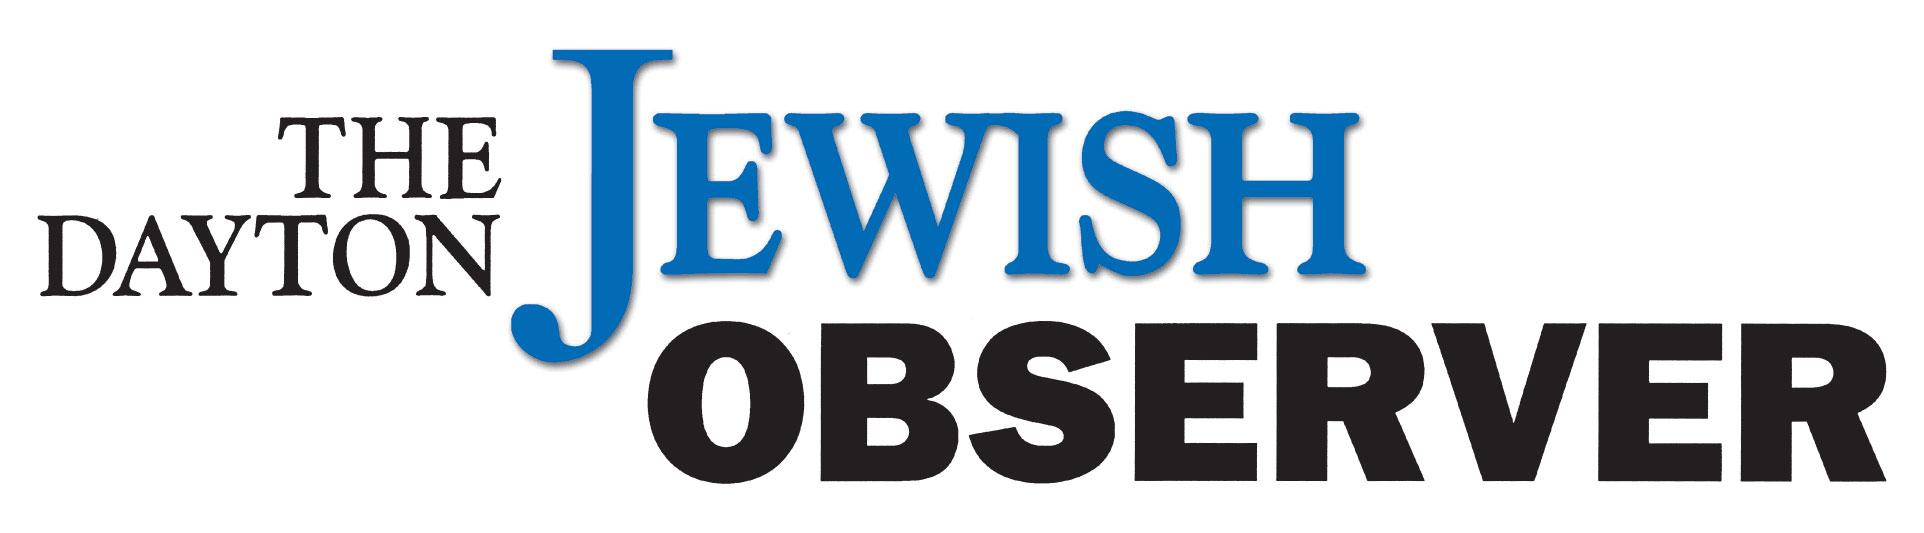 The Dayton Jewish Observer